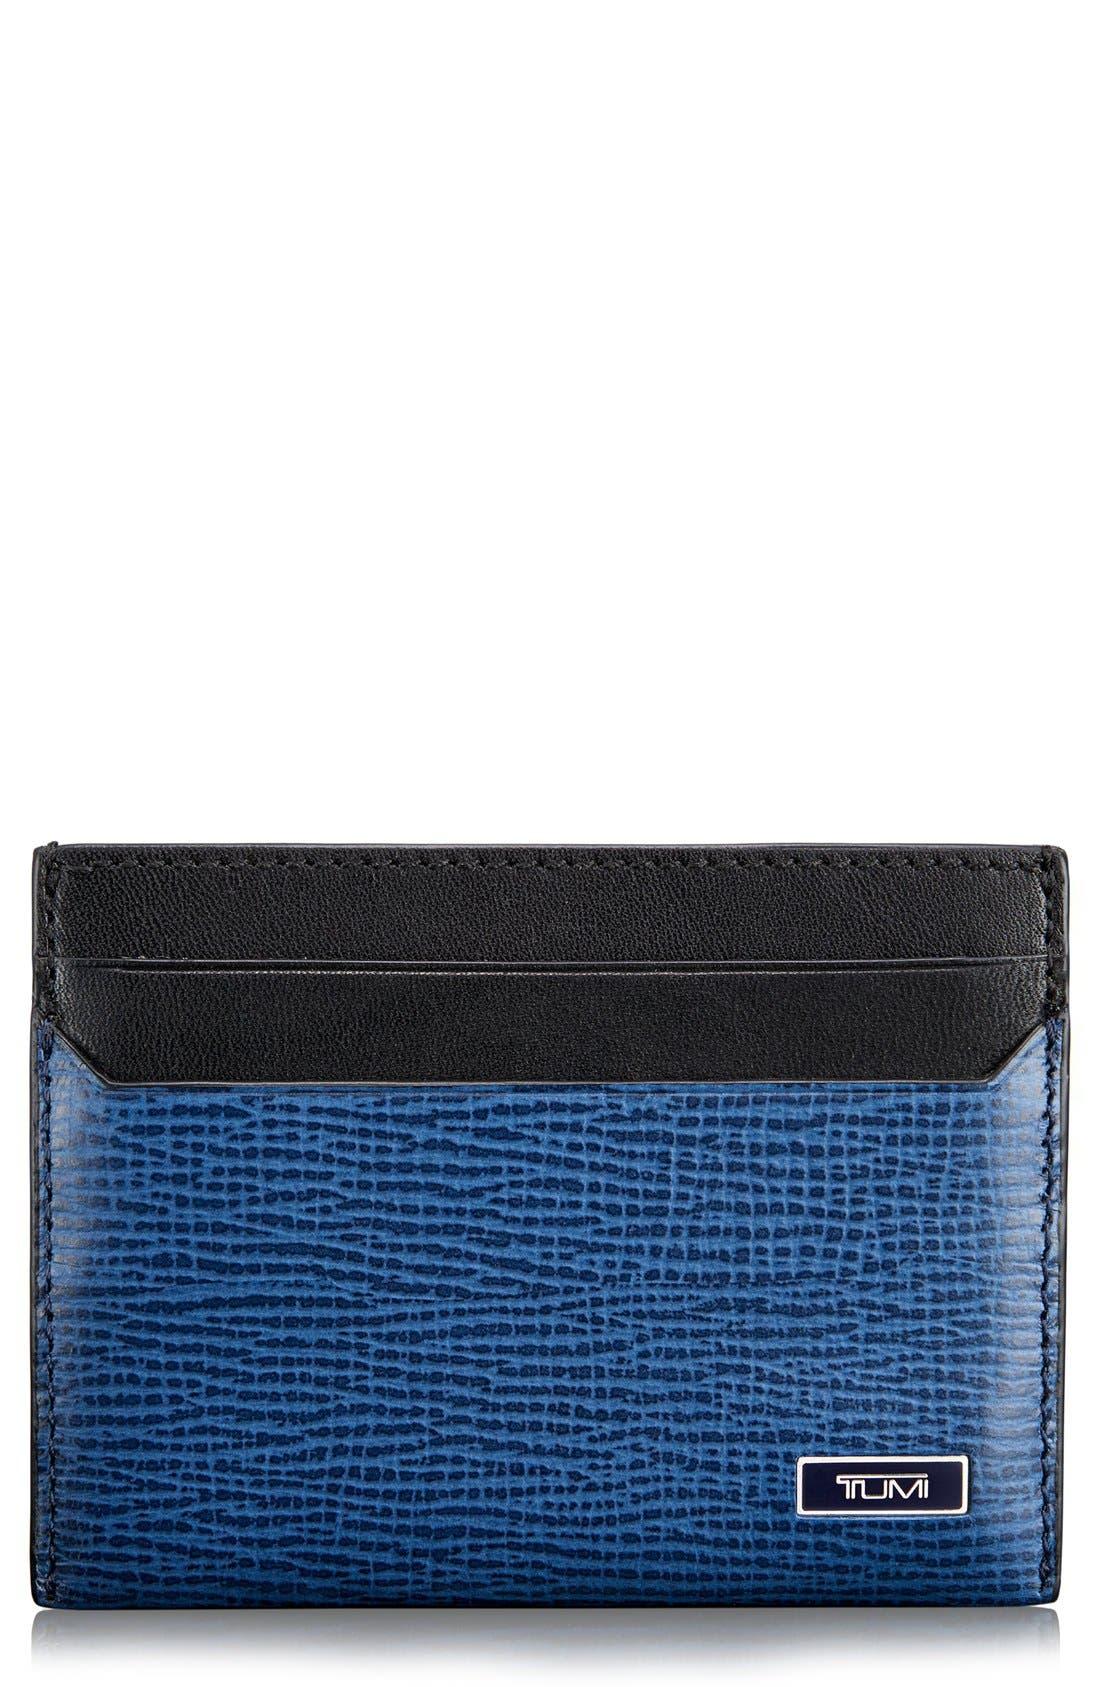 Monaco Slim Leather Card Case,                         Main,                         color, COBALT